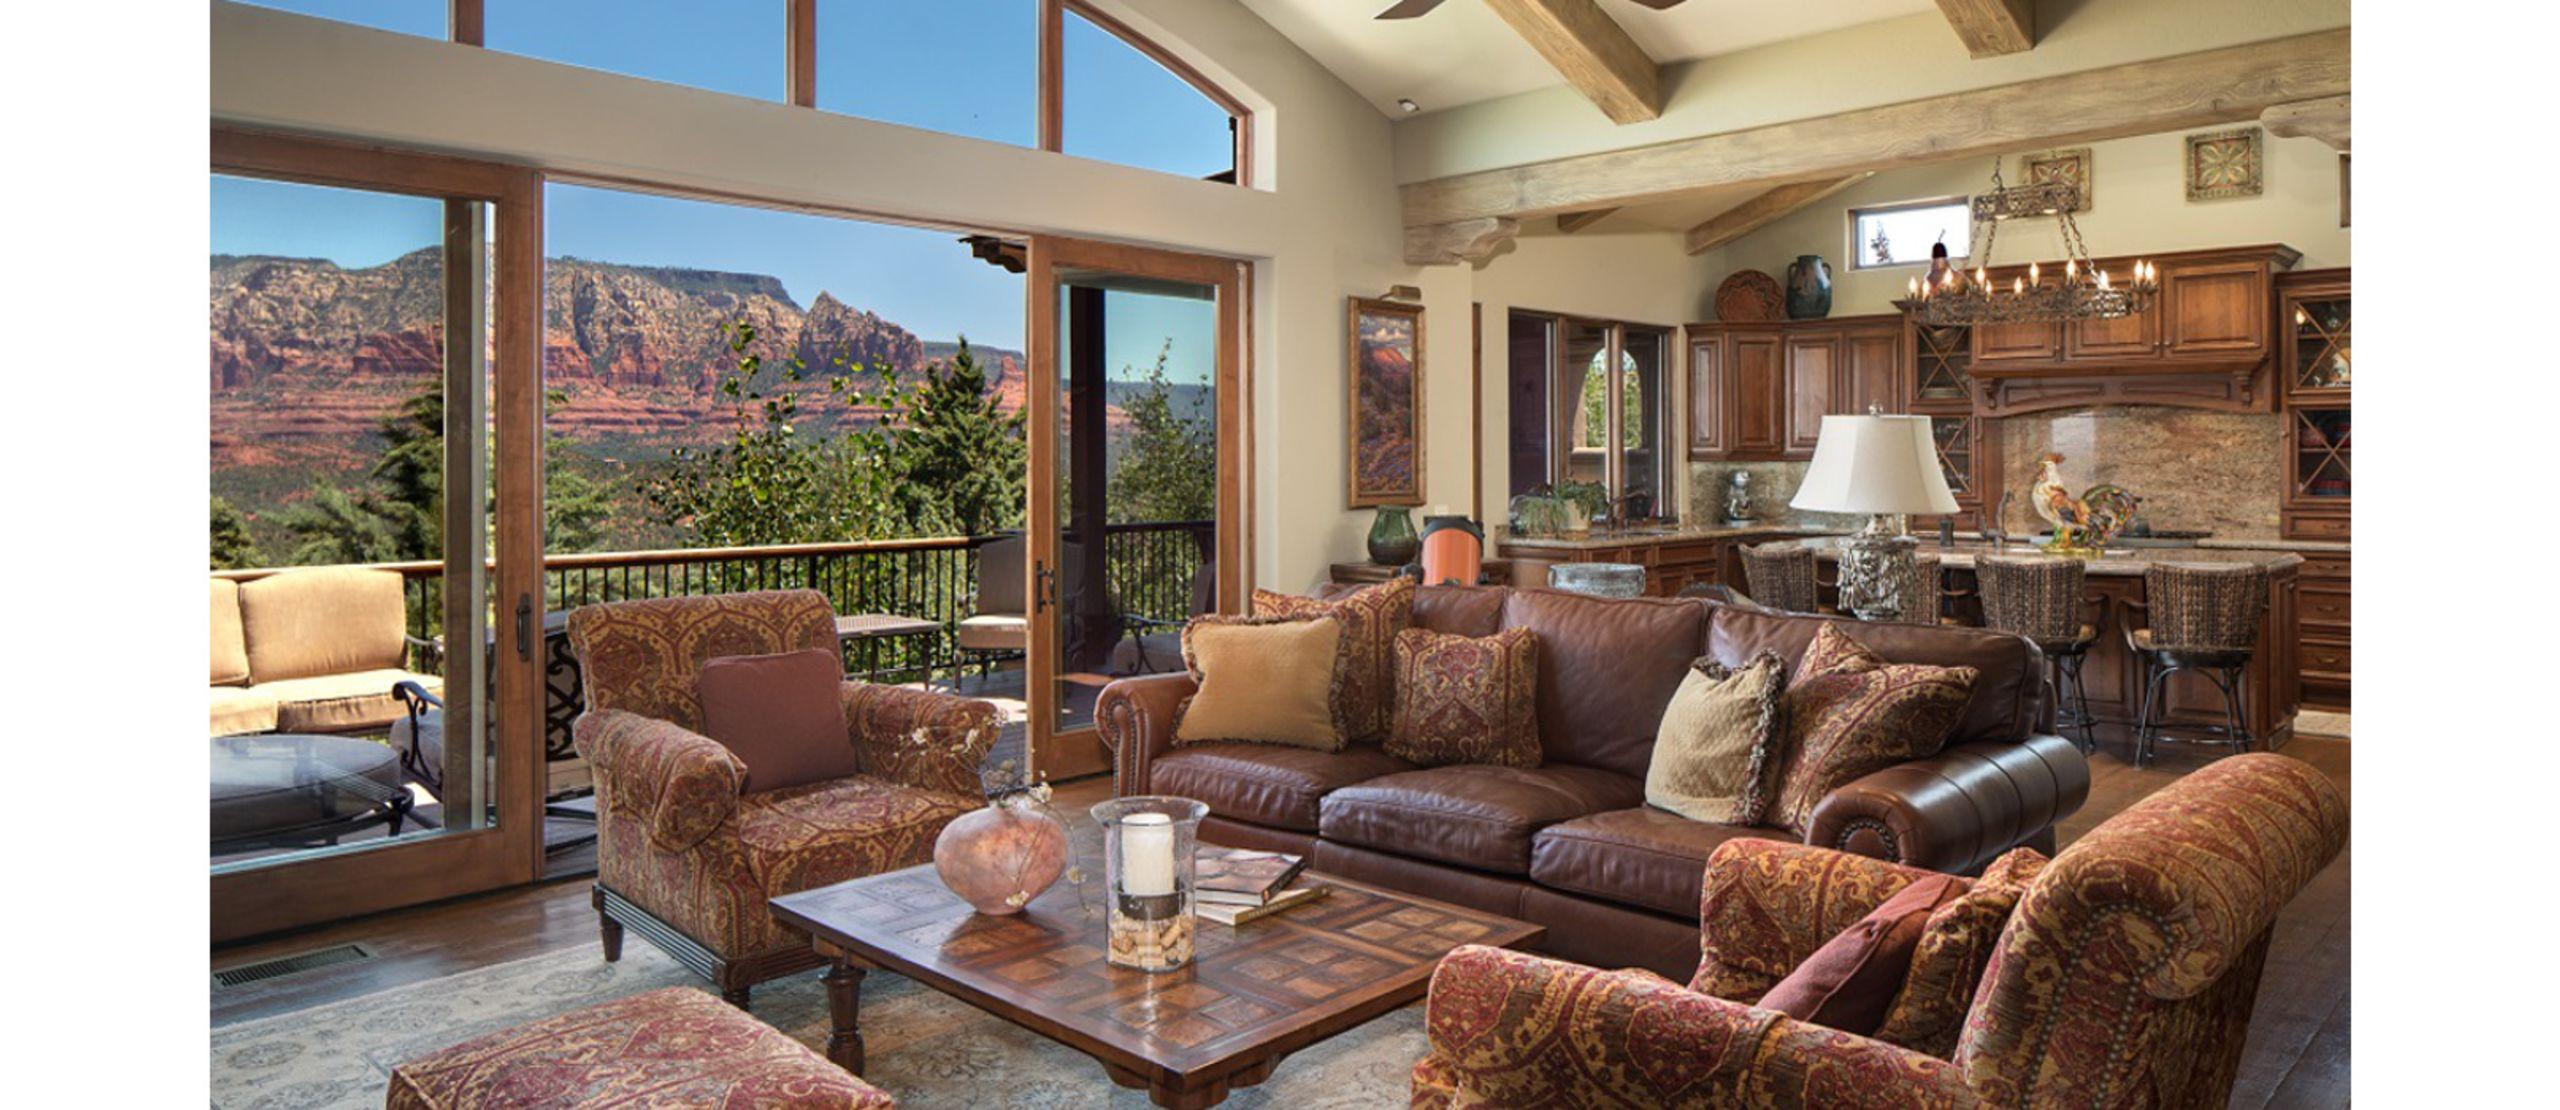 Great Room overlooks Panoramic Red Rock Views